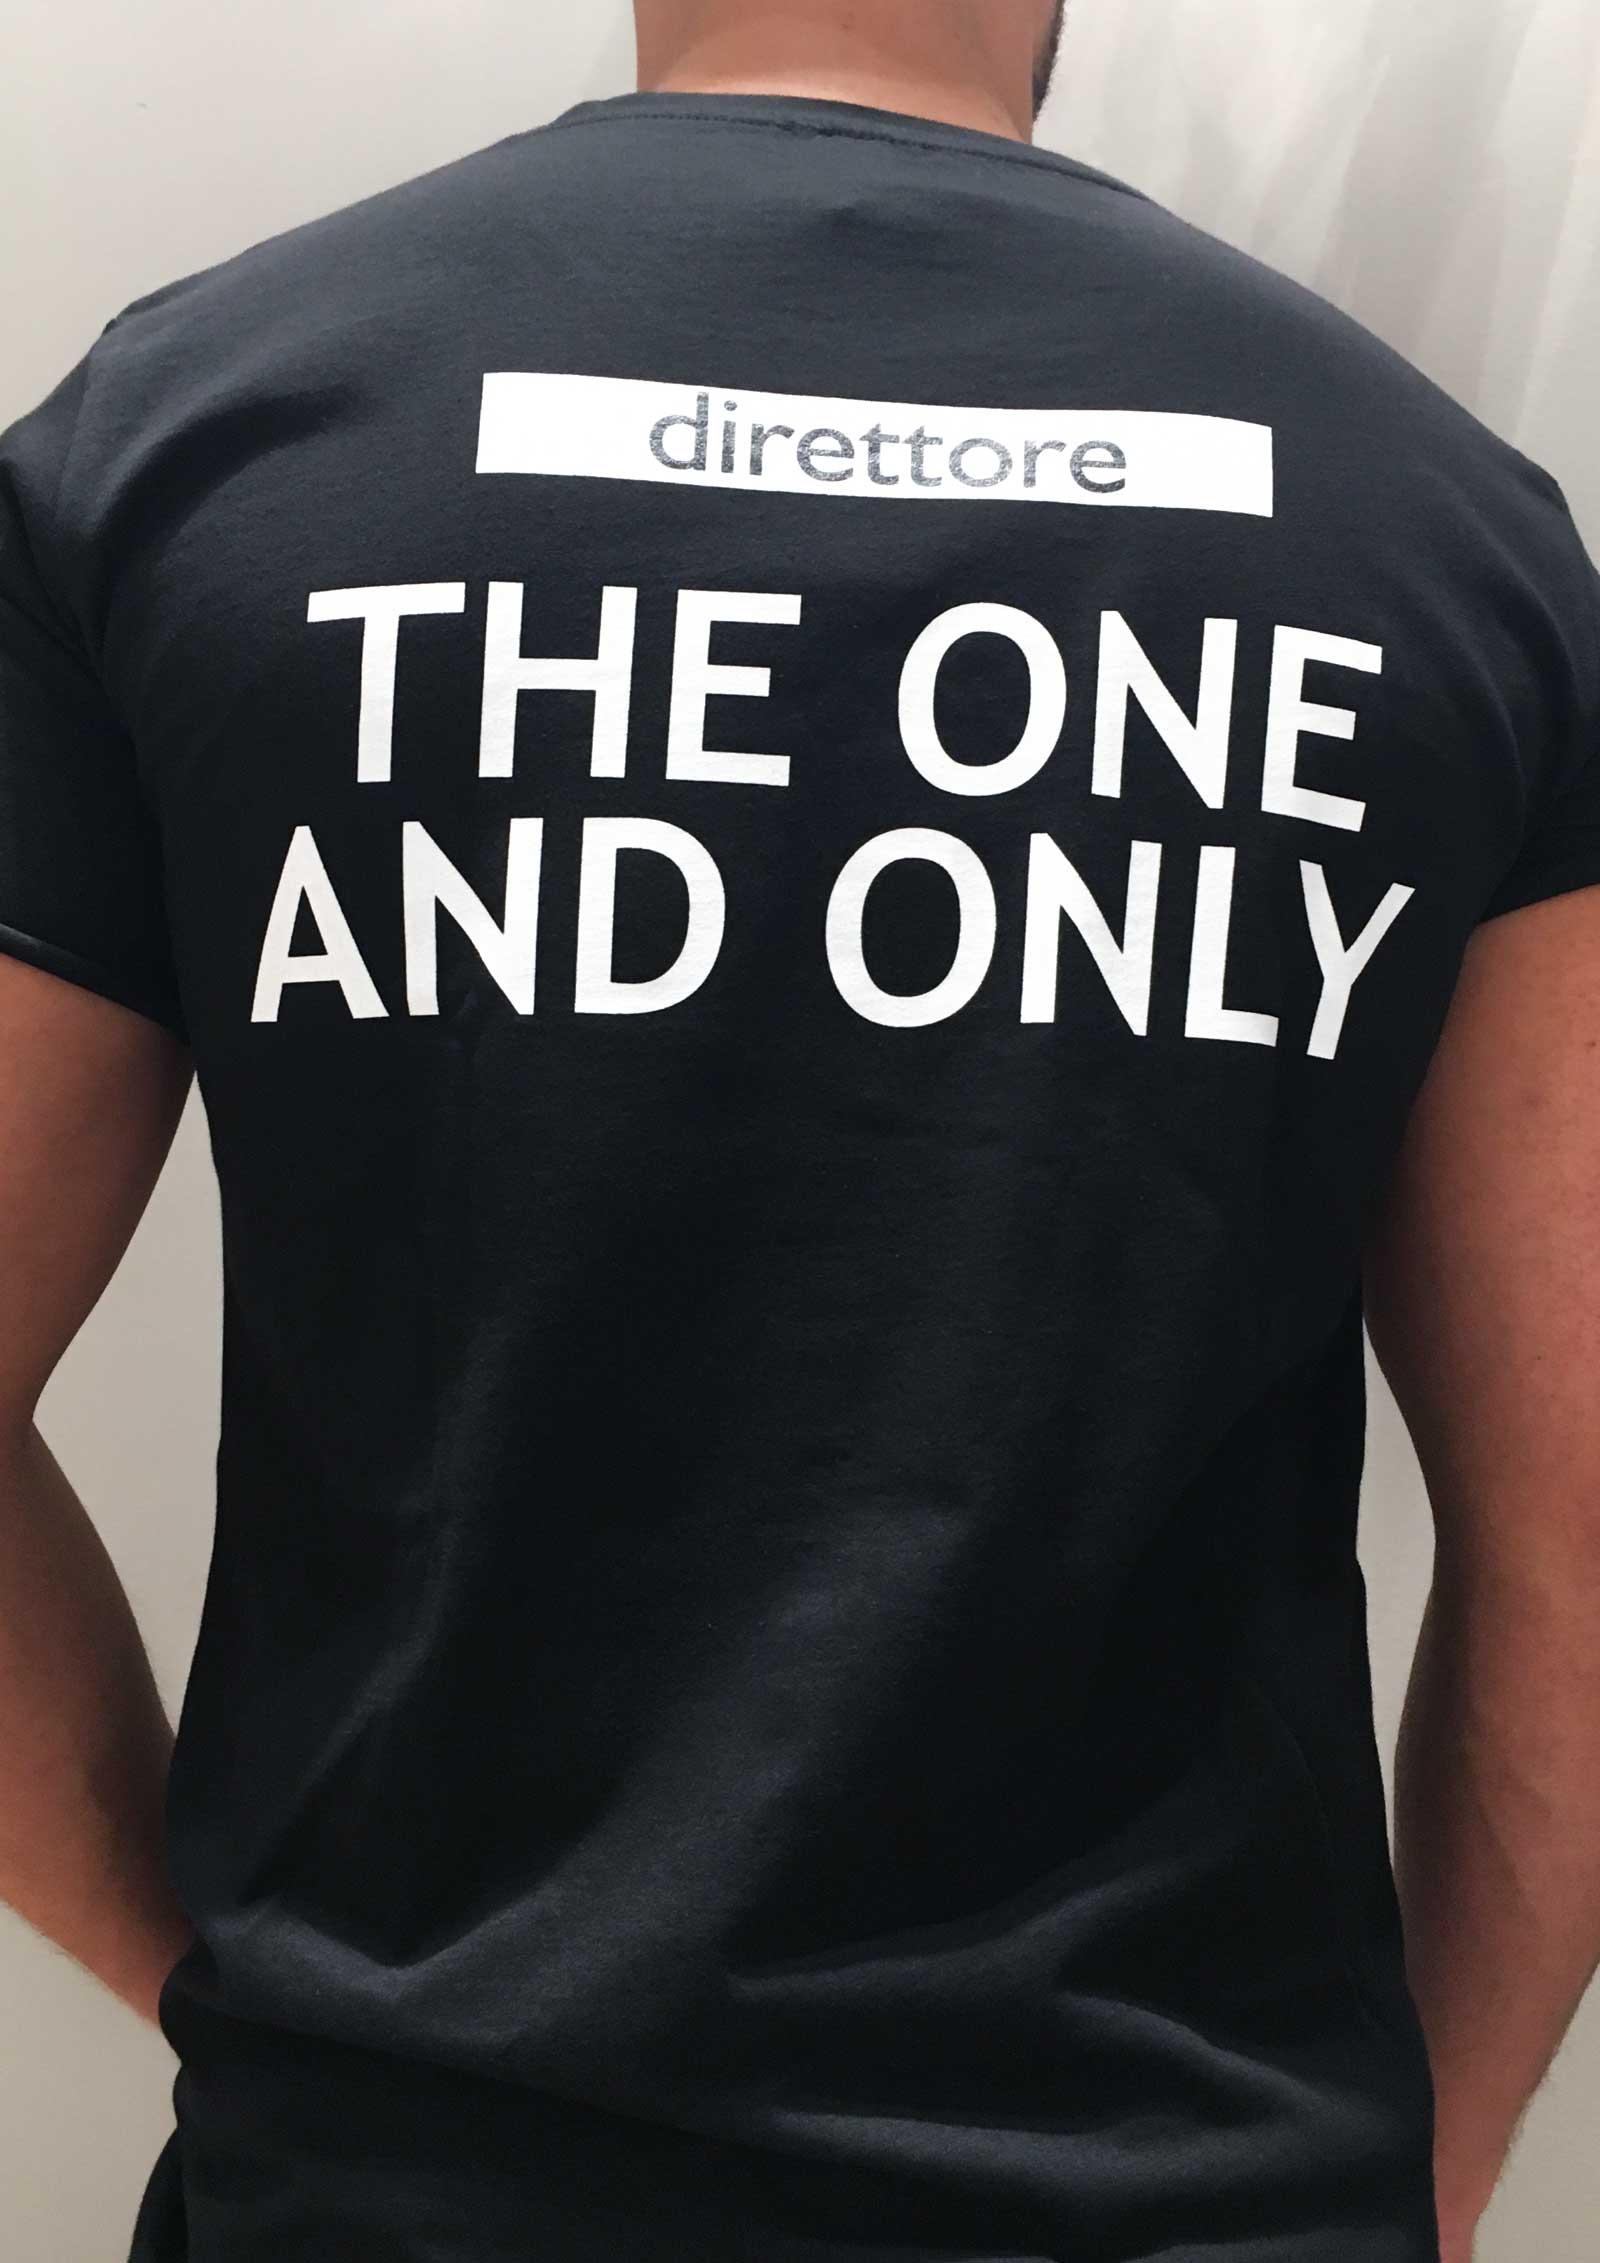 Full Size of Baby T Shirt Coole Sprüche Coole T Shirt Sprüche Für Männer Coole T Shirt Sprüche Coole Sprüche Für Baby T Shirt Küche Coole T Shirt Sprüche